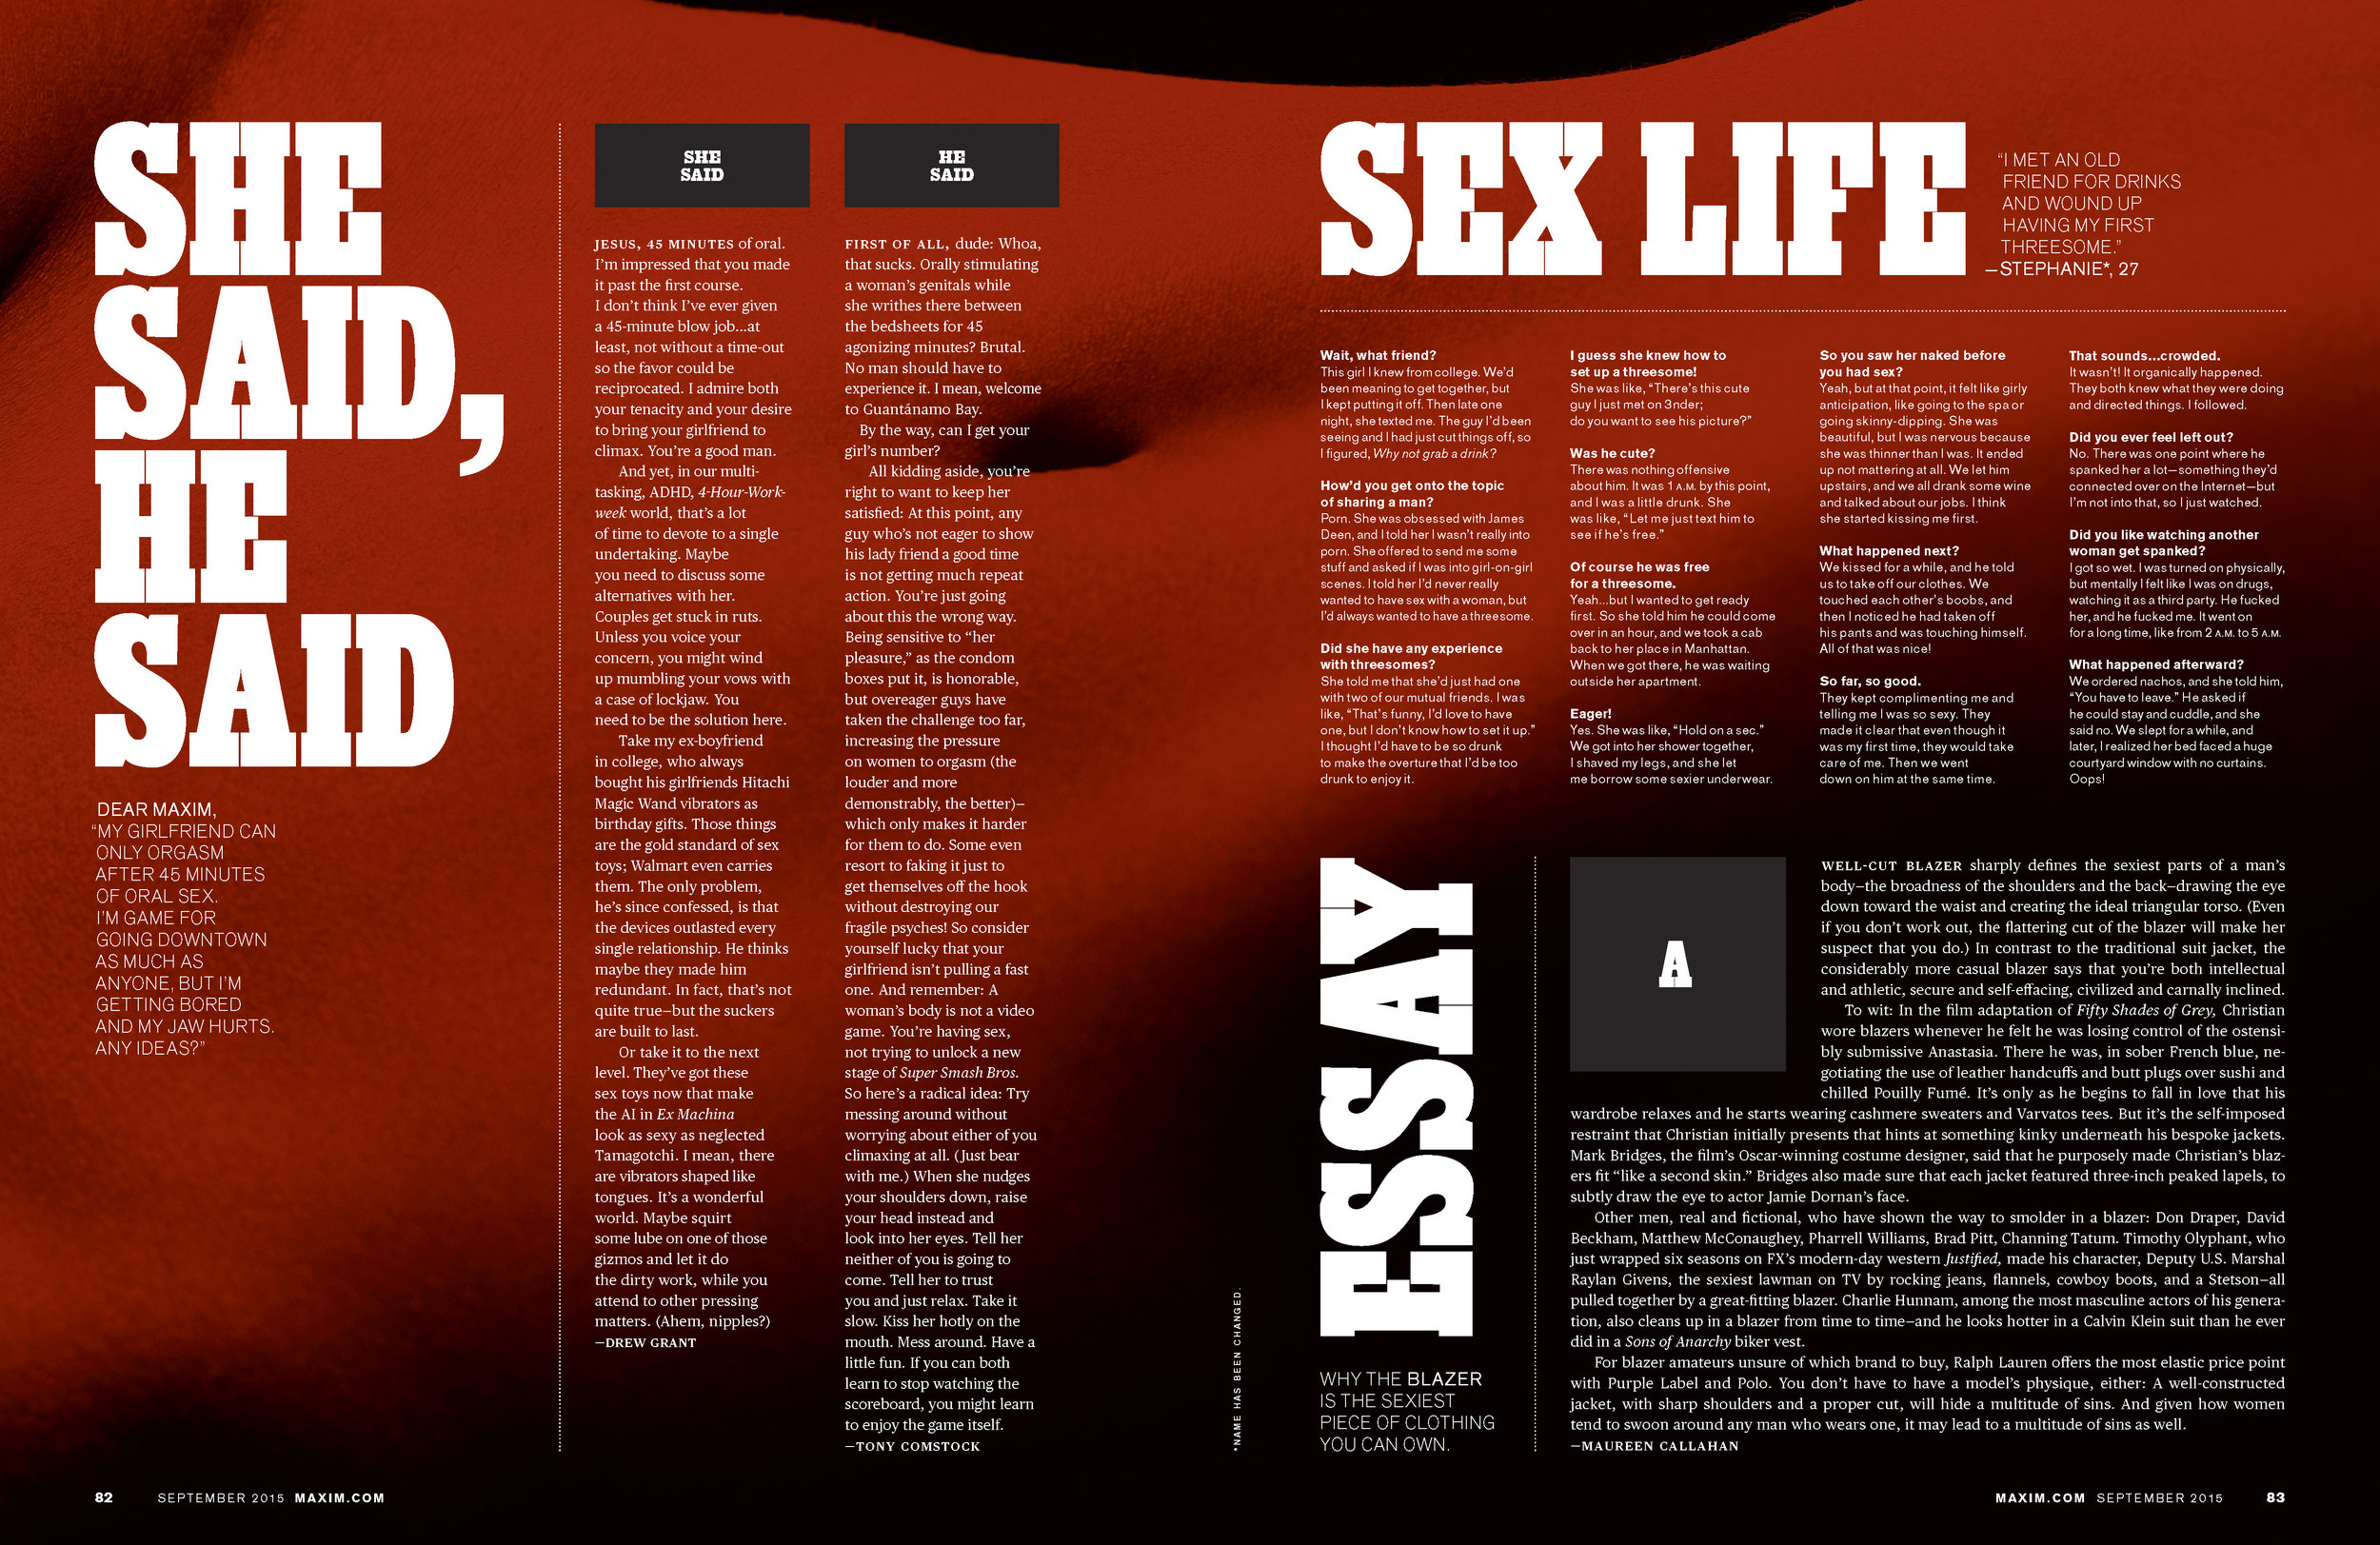 RE_BRAND_Page_19.jpg